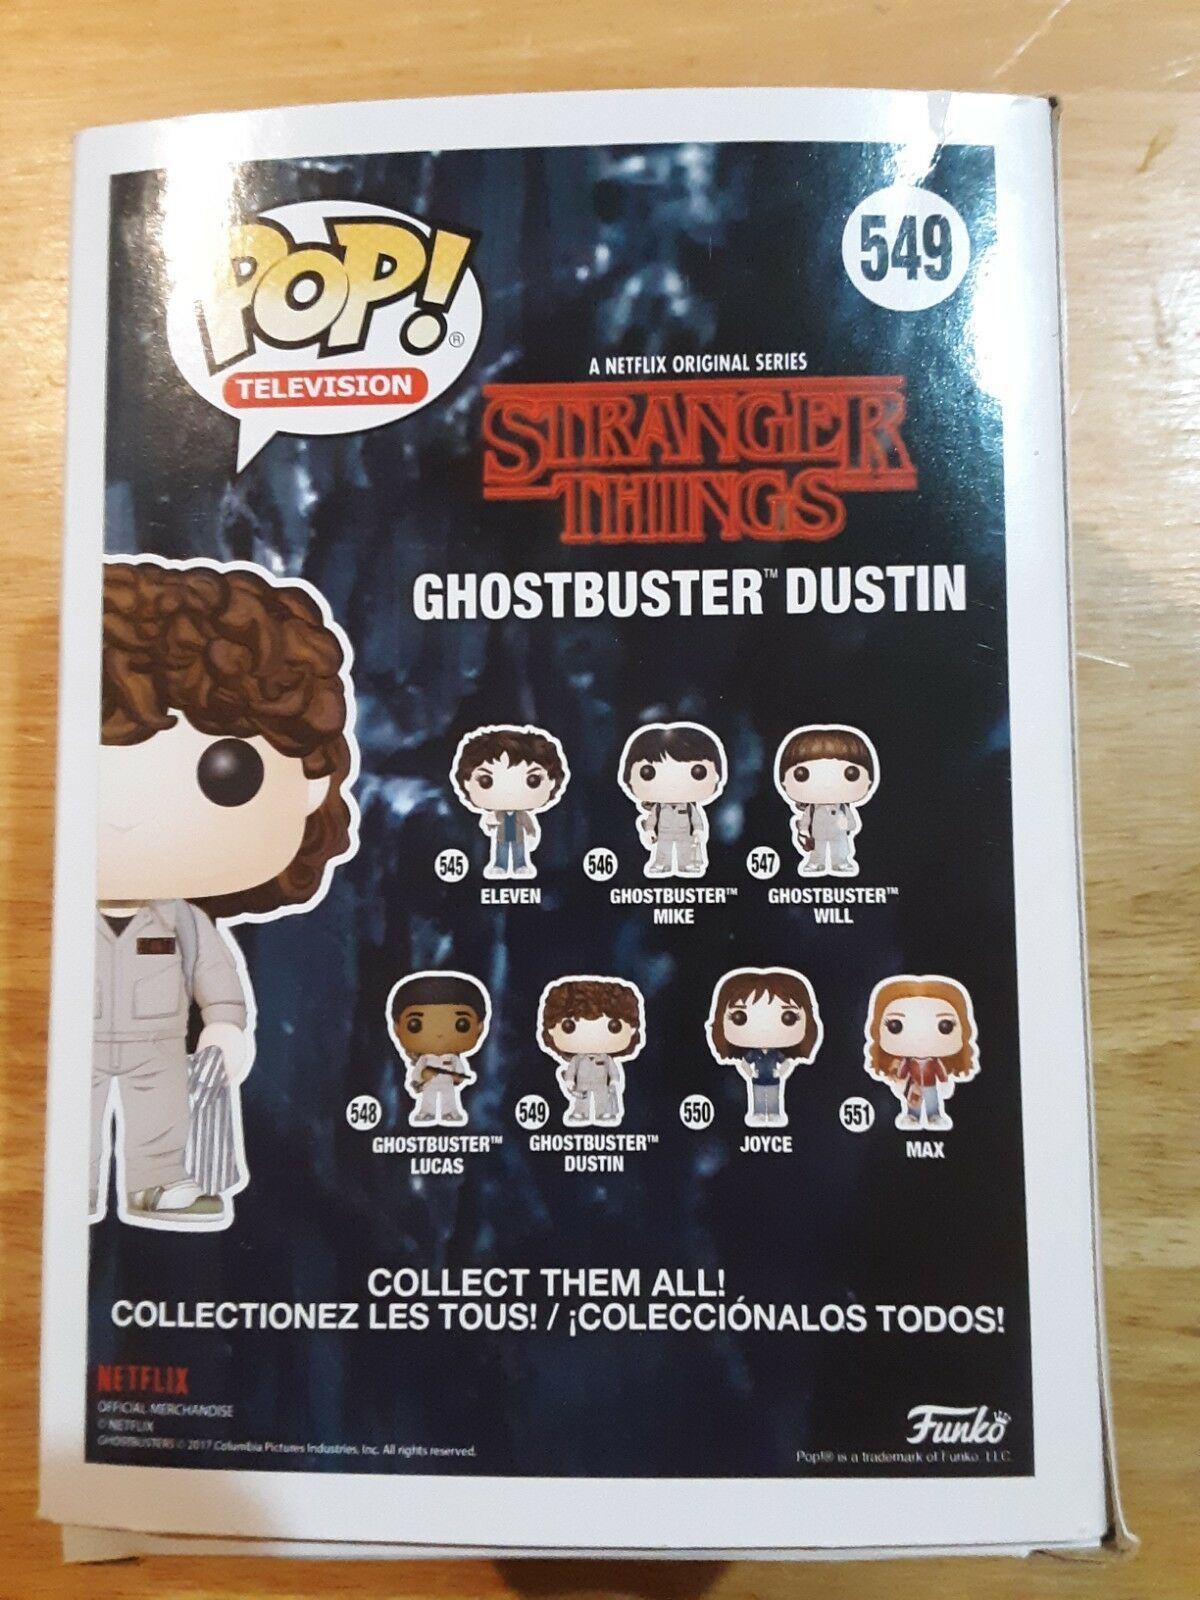 Stranger Things Ghostbuster Dustin Pop! Television Vinyl Figure